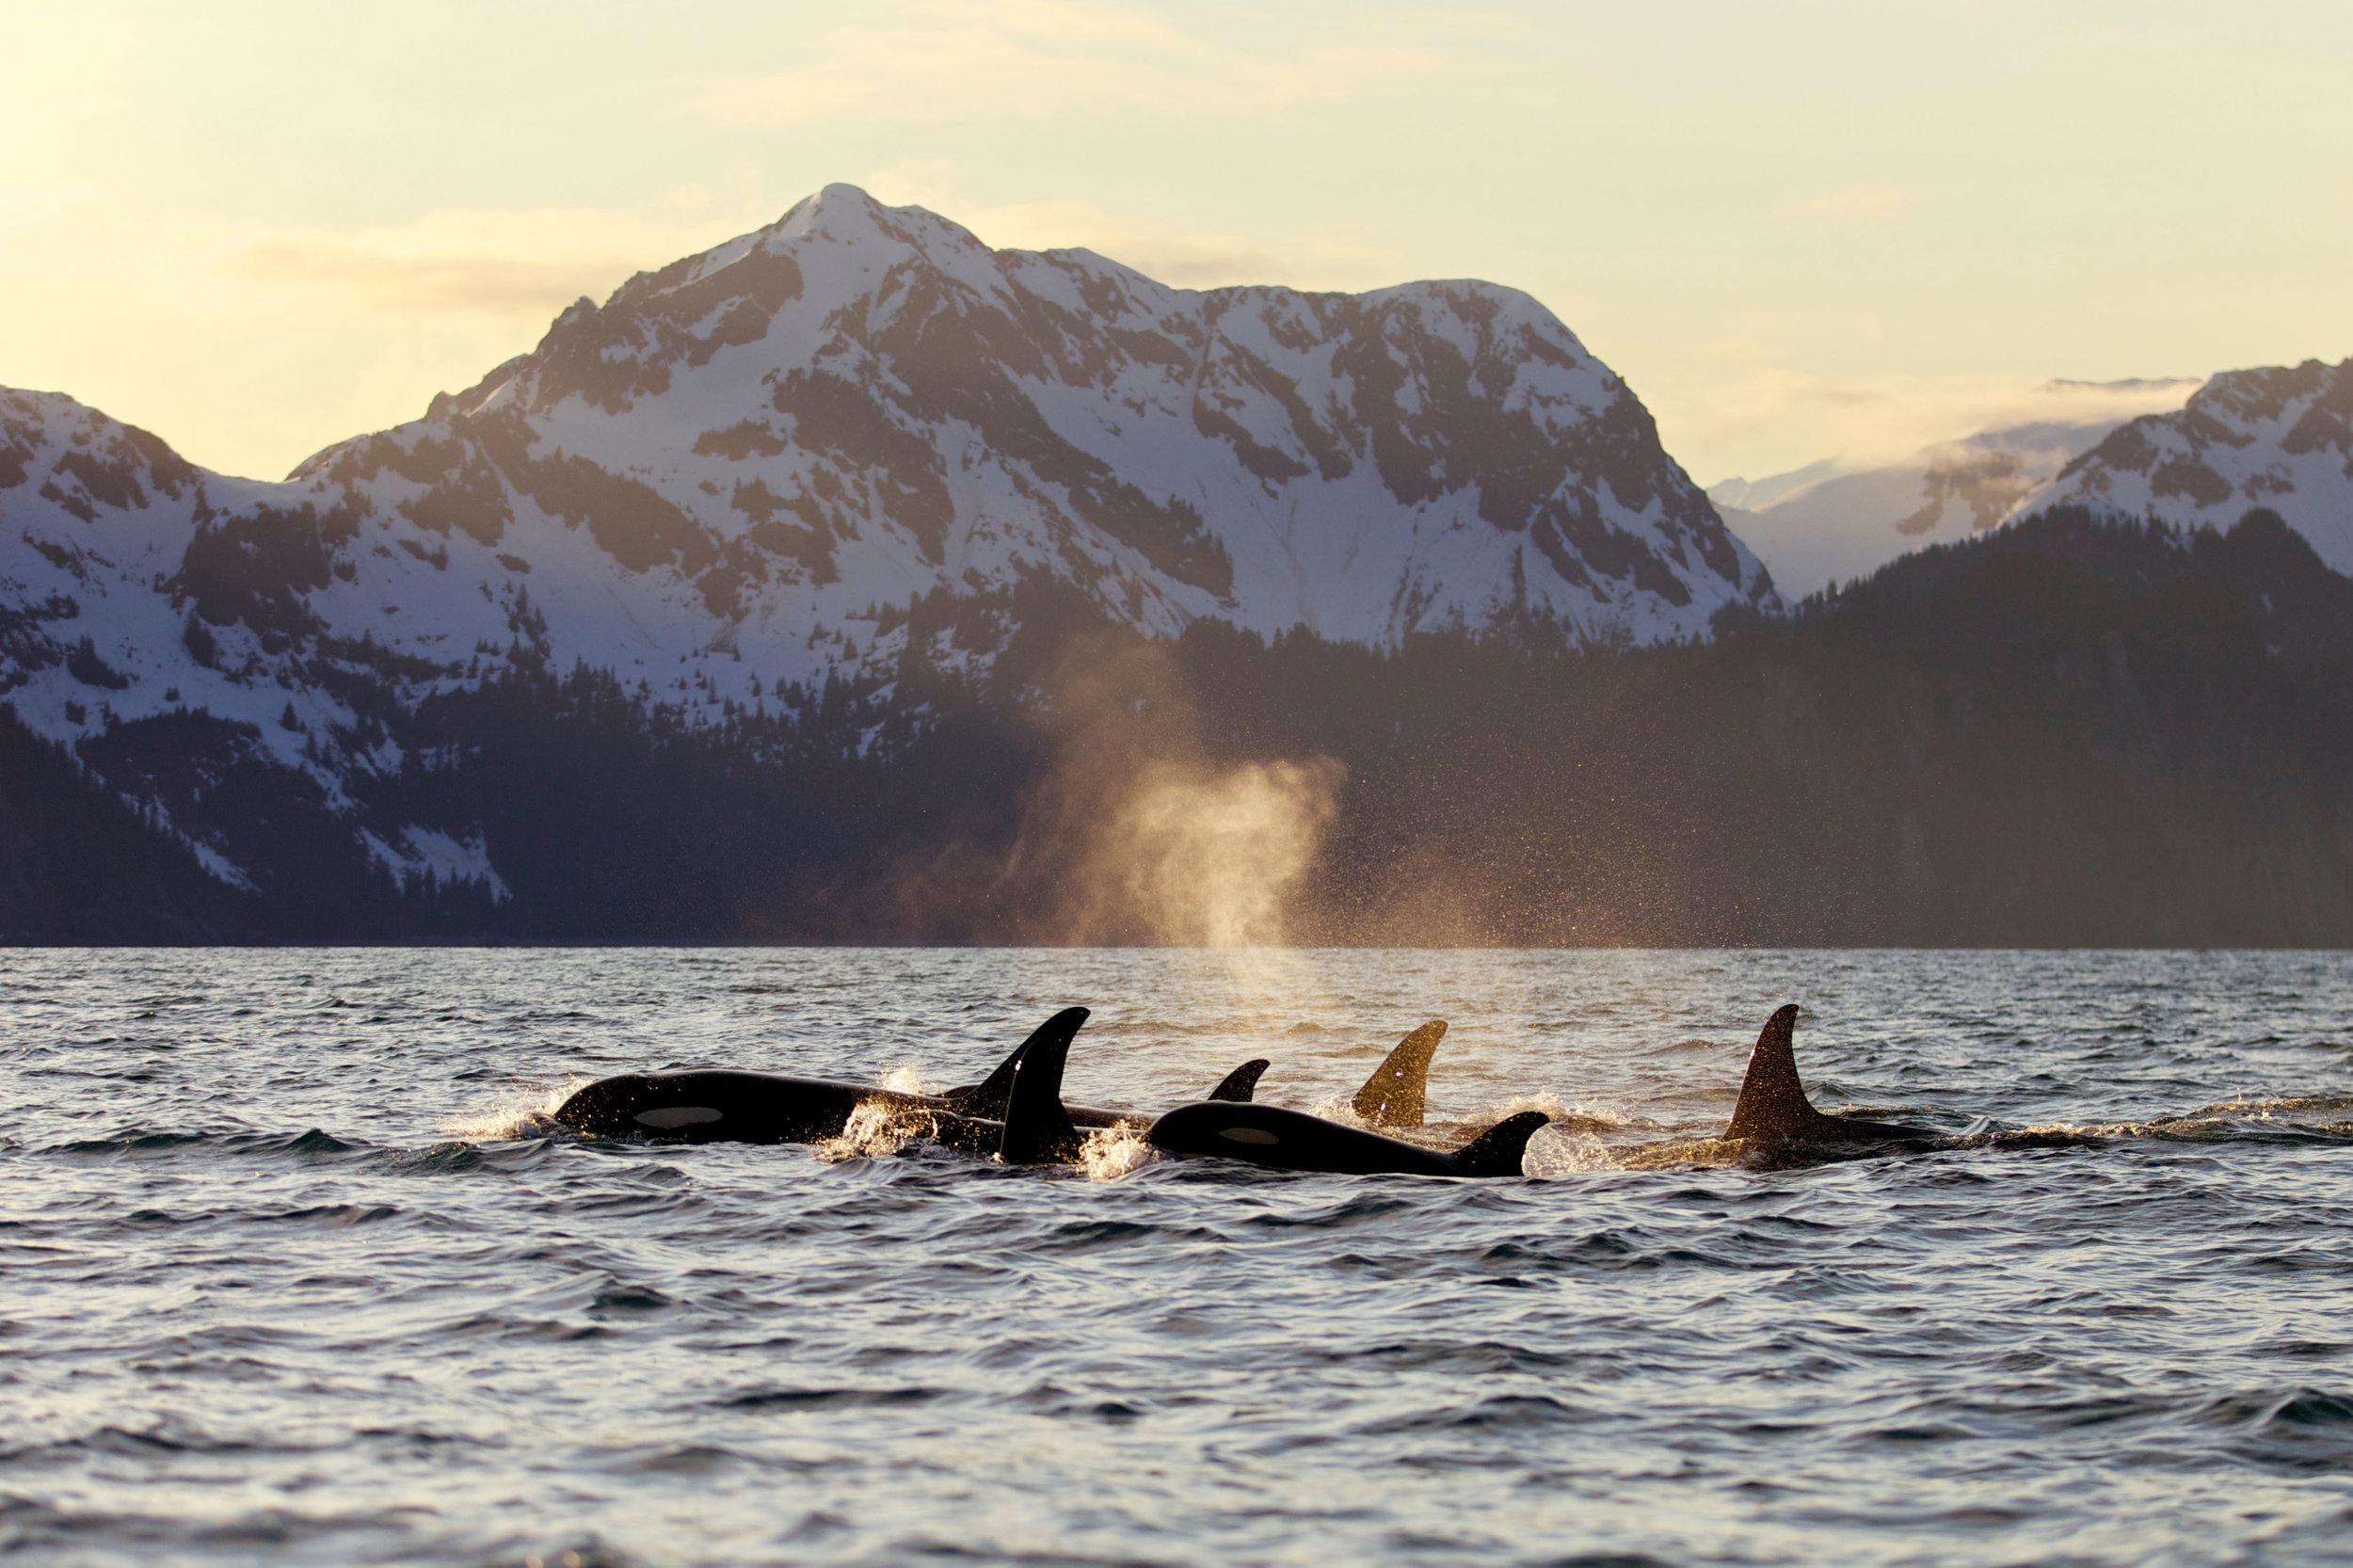 AL_CPXY9W_Orcas_Kenai Fjords National Park.jpg